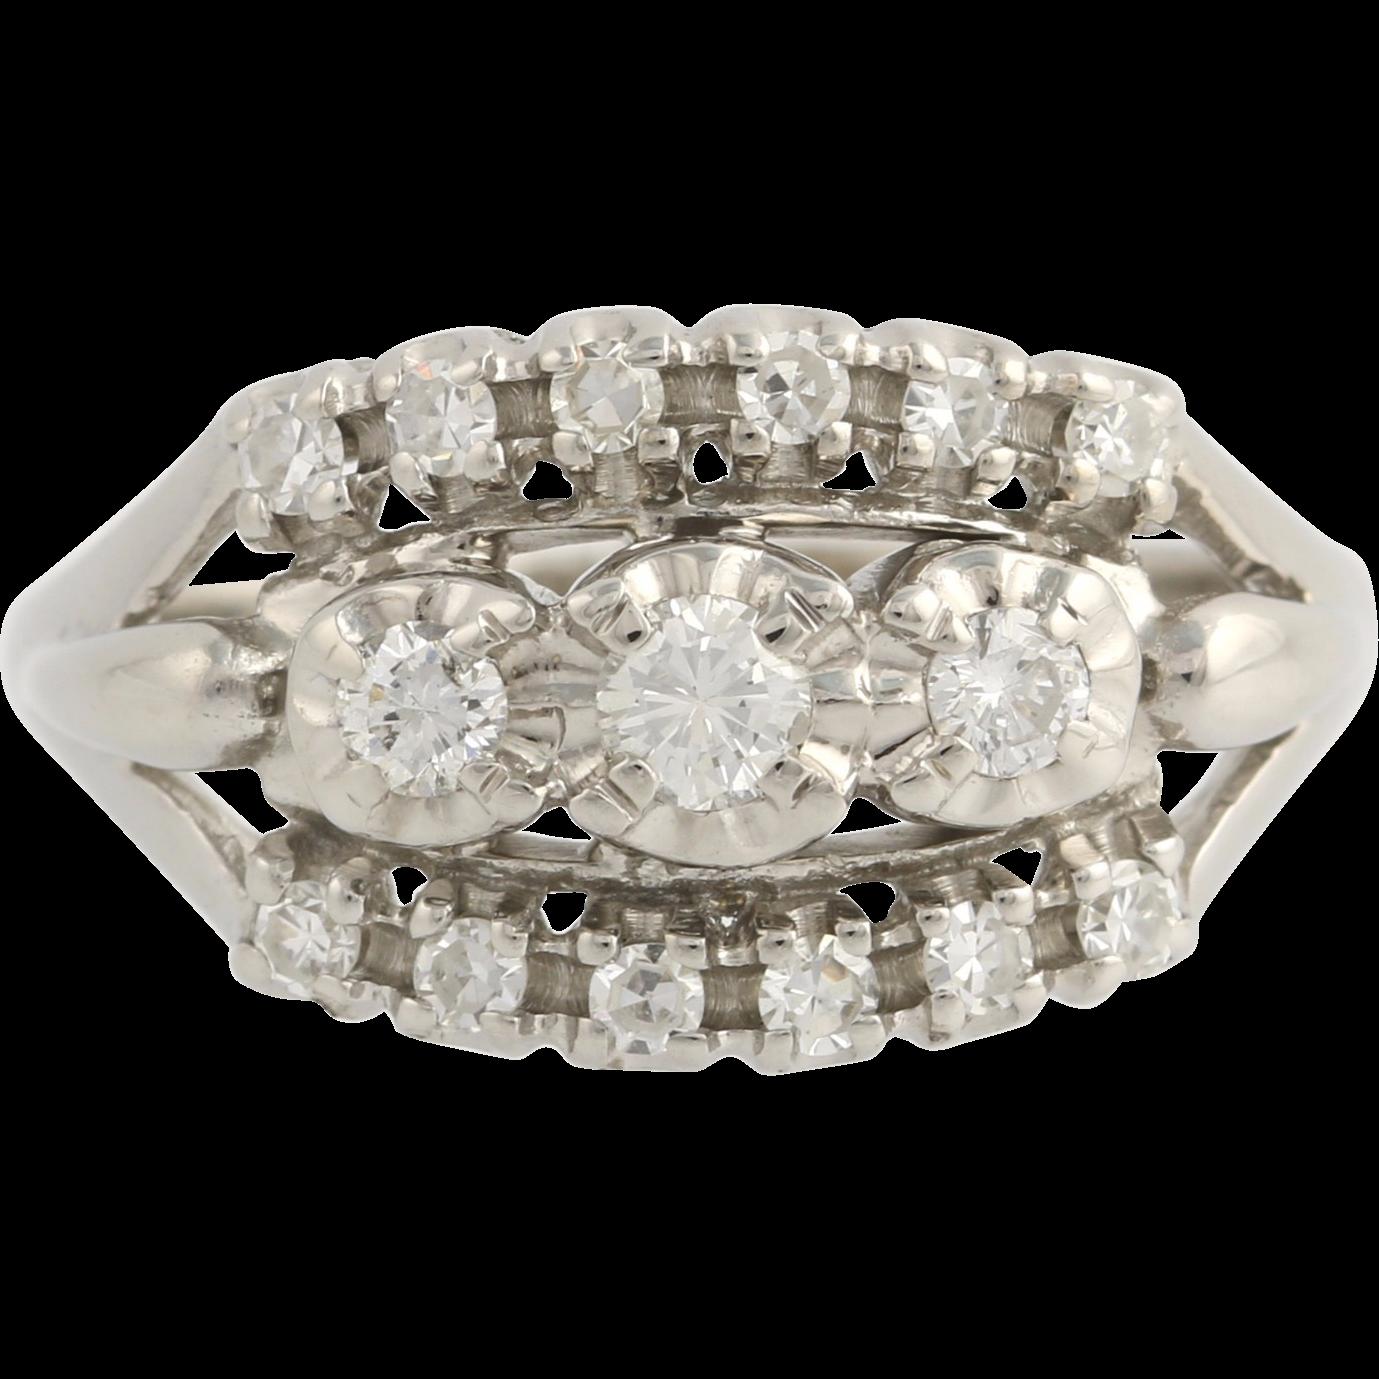 Vintage Diamond Cocktail Ring - 18k White Gold Women's 7 1/2 Genuine .47ctw